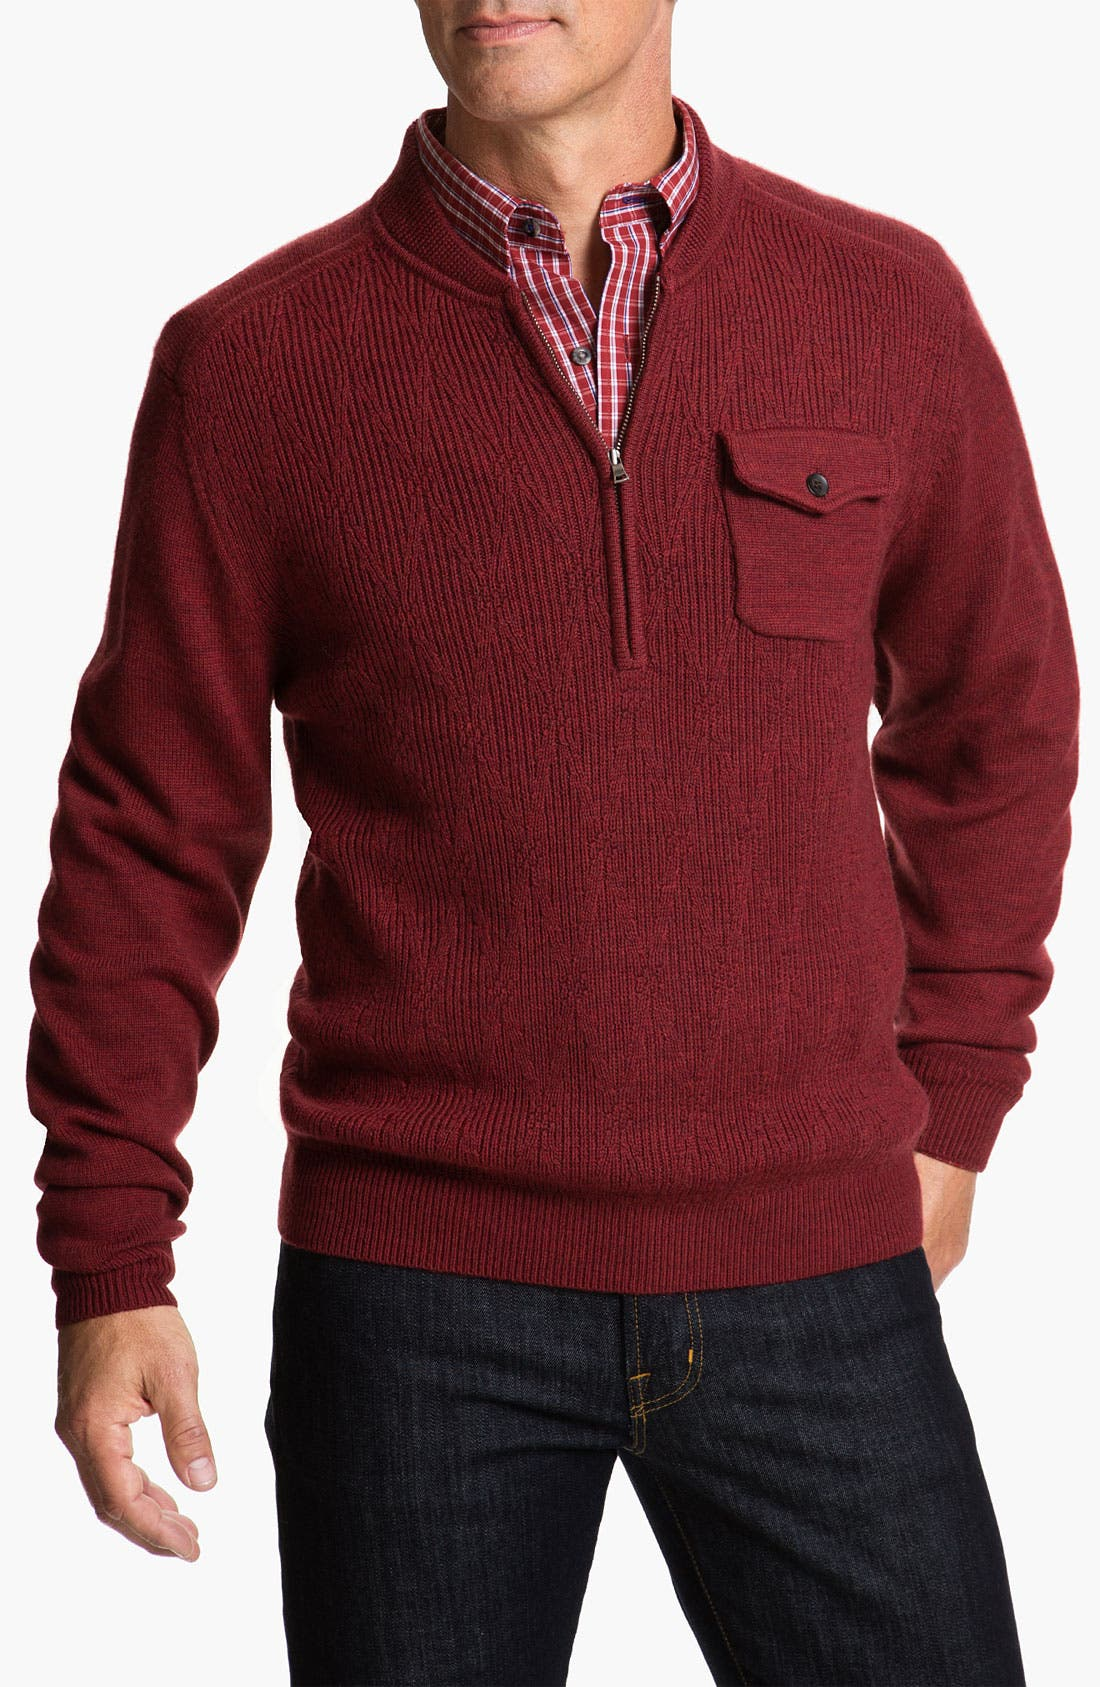 Main Image - Cutter & Buck 'Brandywine' Argyle Textured Merino Wool Sweater (Big & Tall)